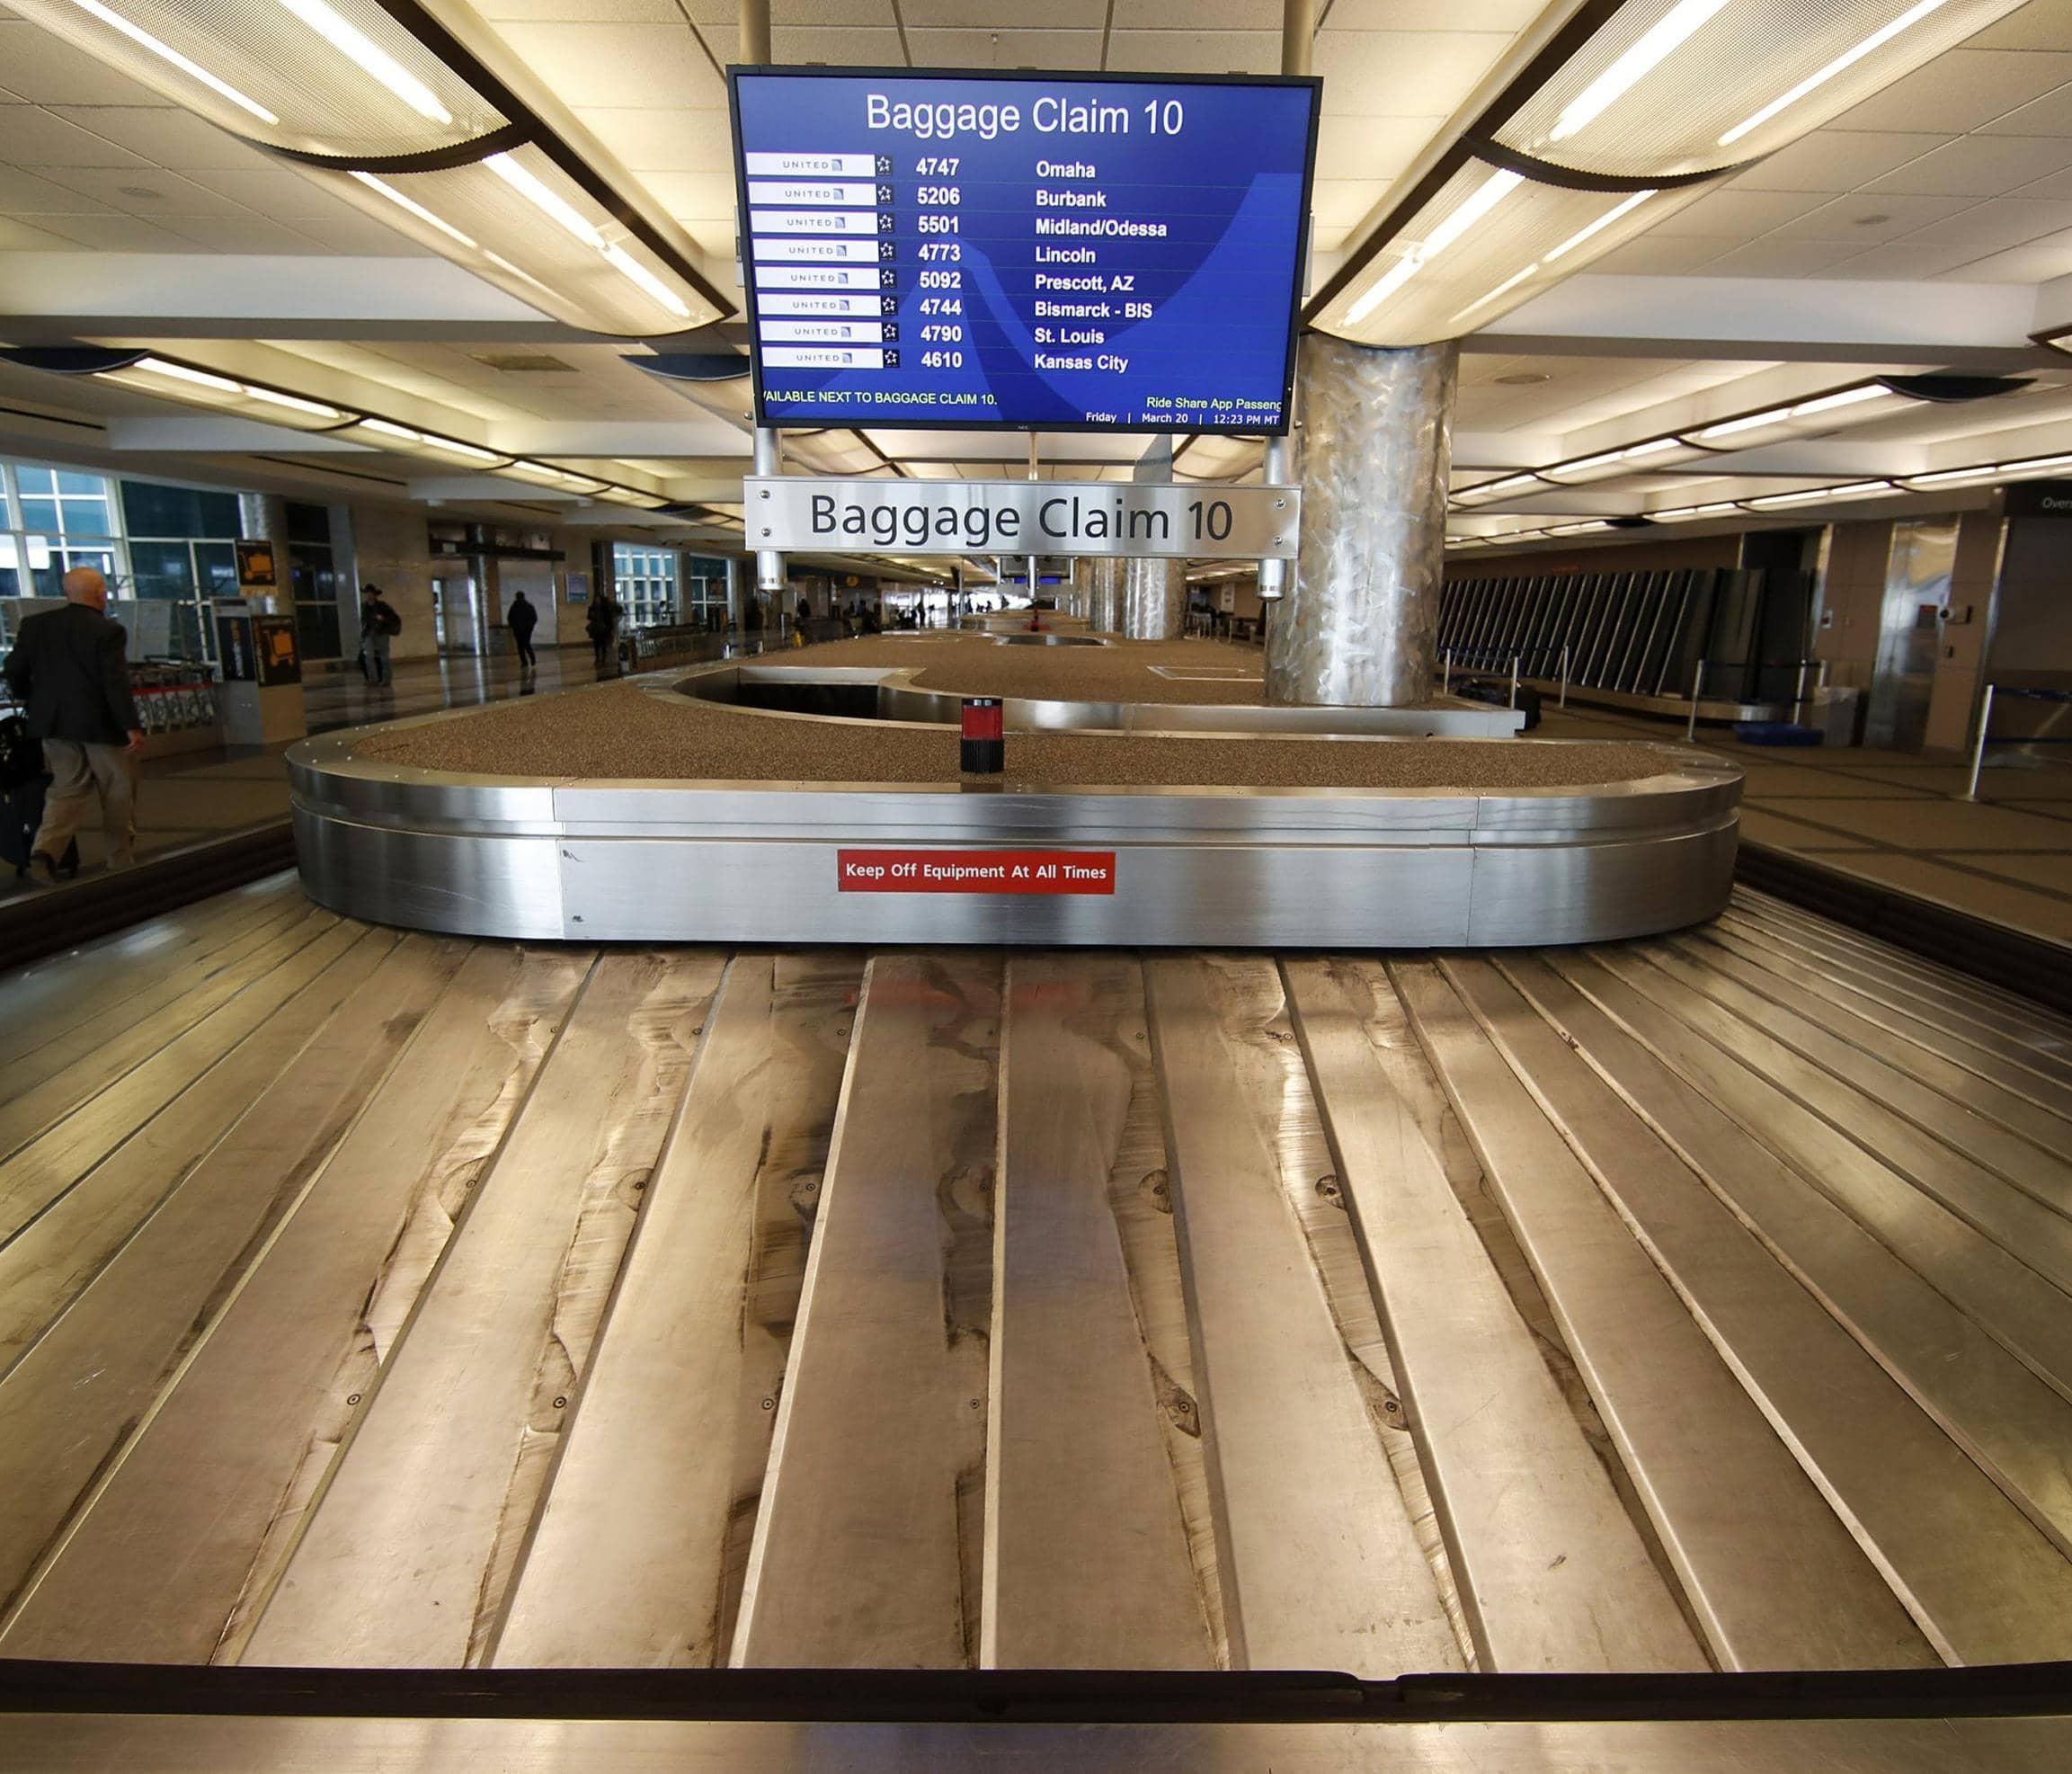 MANY AIRLINE FLIGHTS NEARLY EMPTY AS VIRUS UNDERCUTS TRAVEL